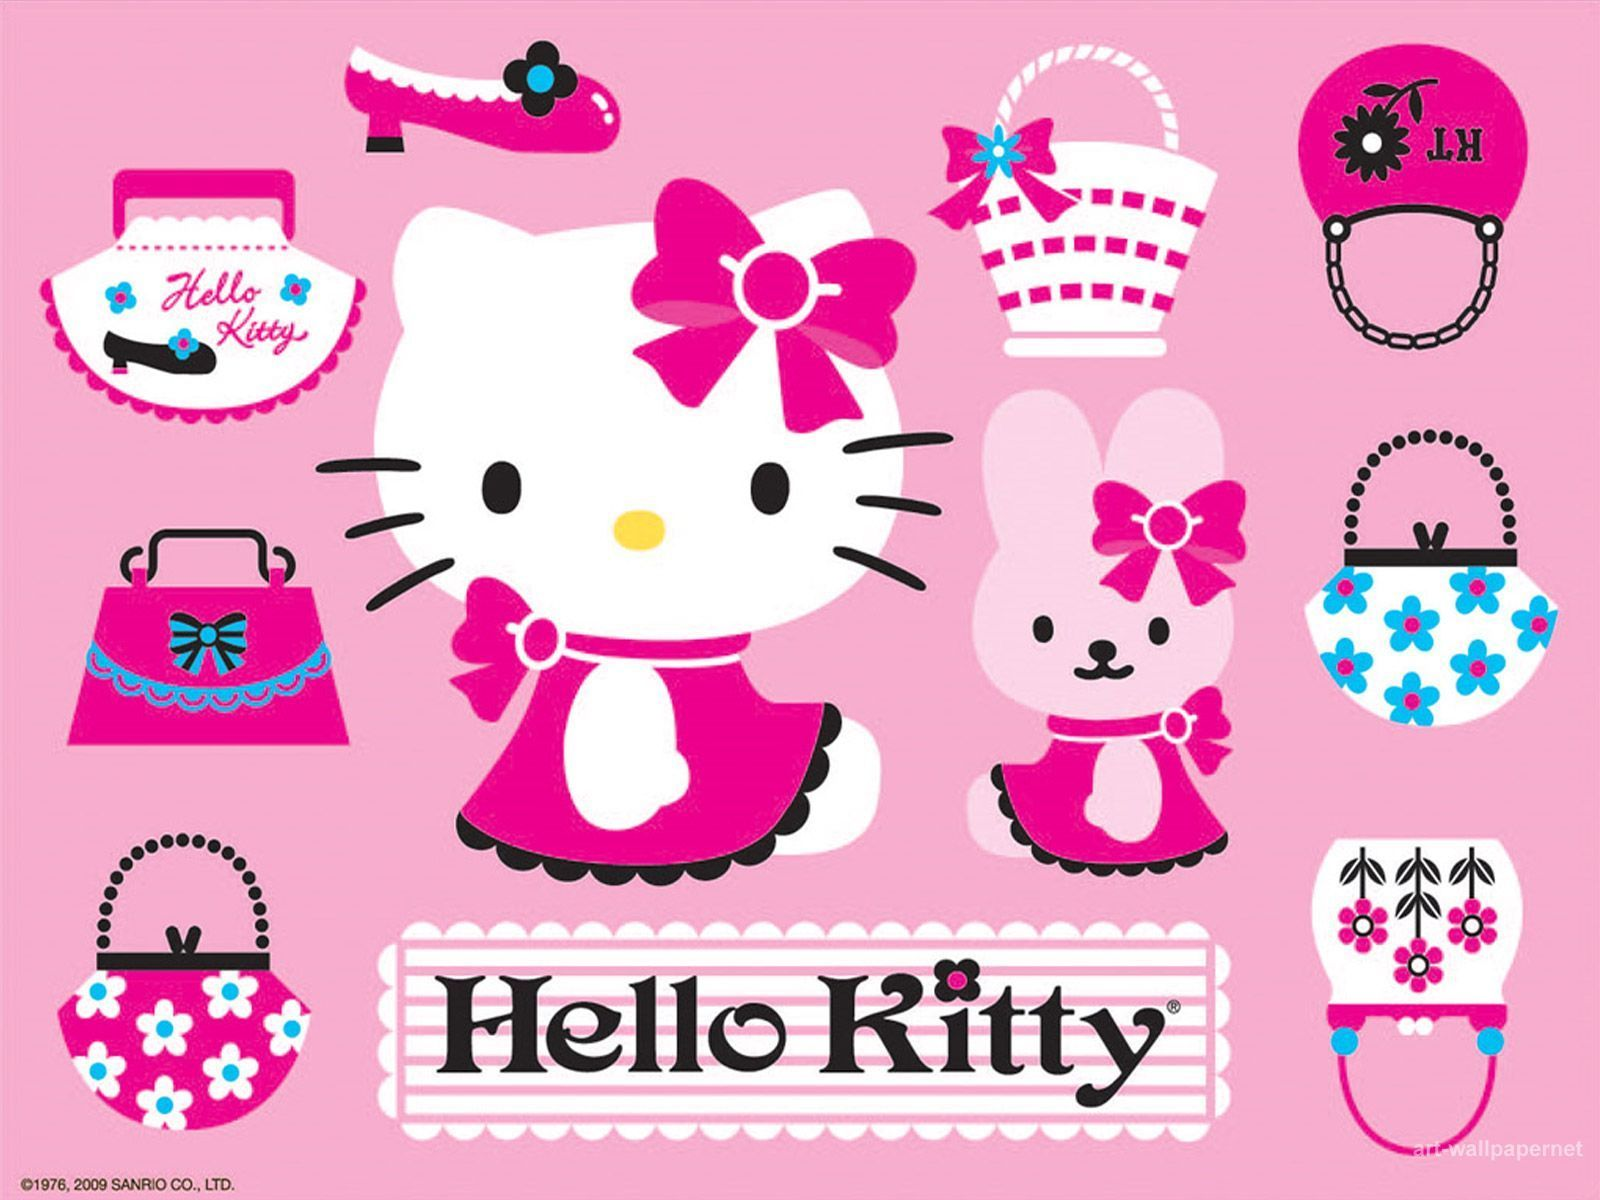 Cool Wallpaper Hello Kitty Desktop Background - 3fafca6a58a8b1a4c7757430b6c29e39  Pictures_23842.jpg